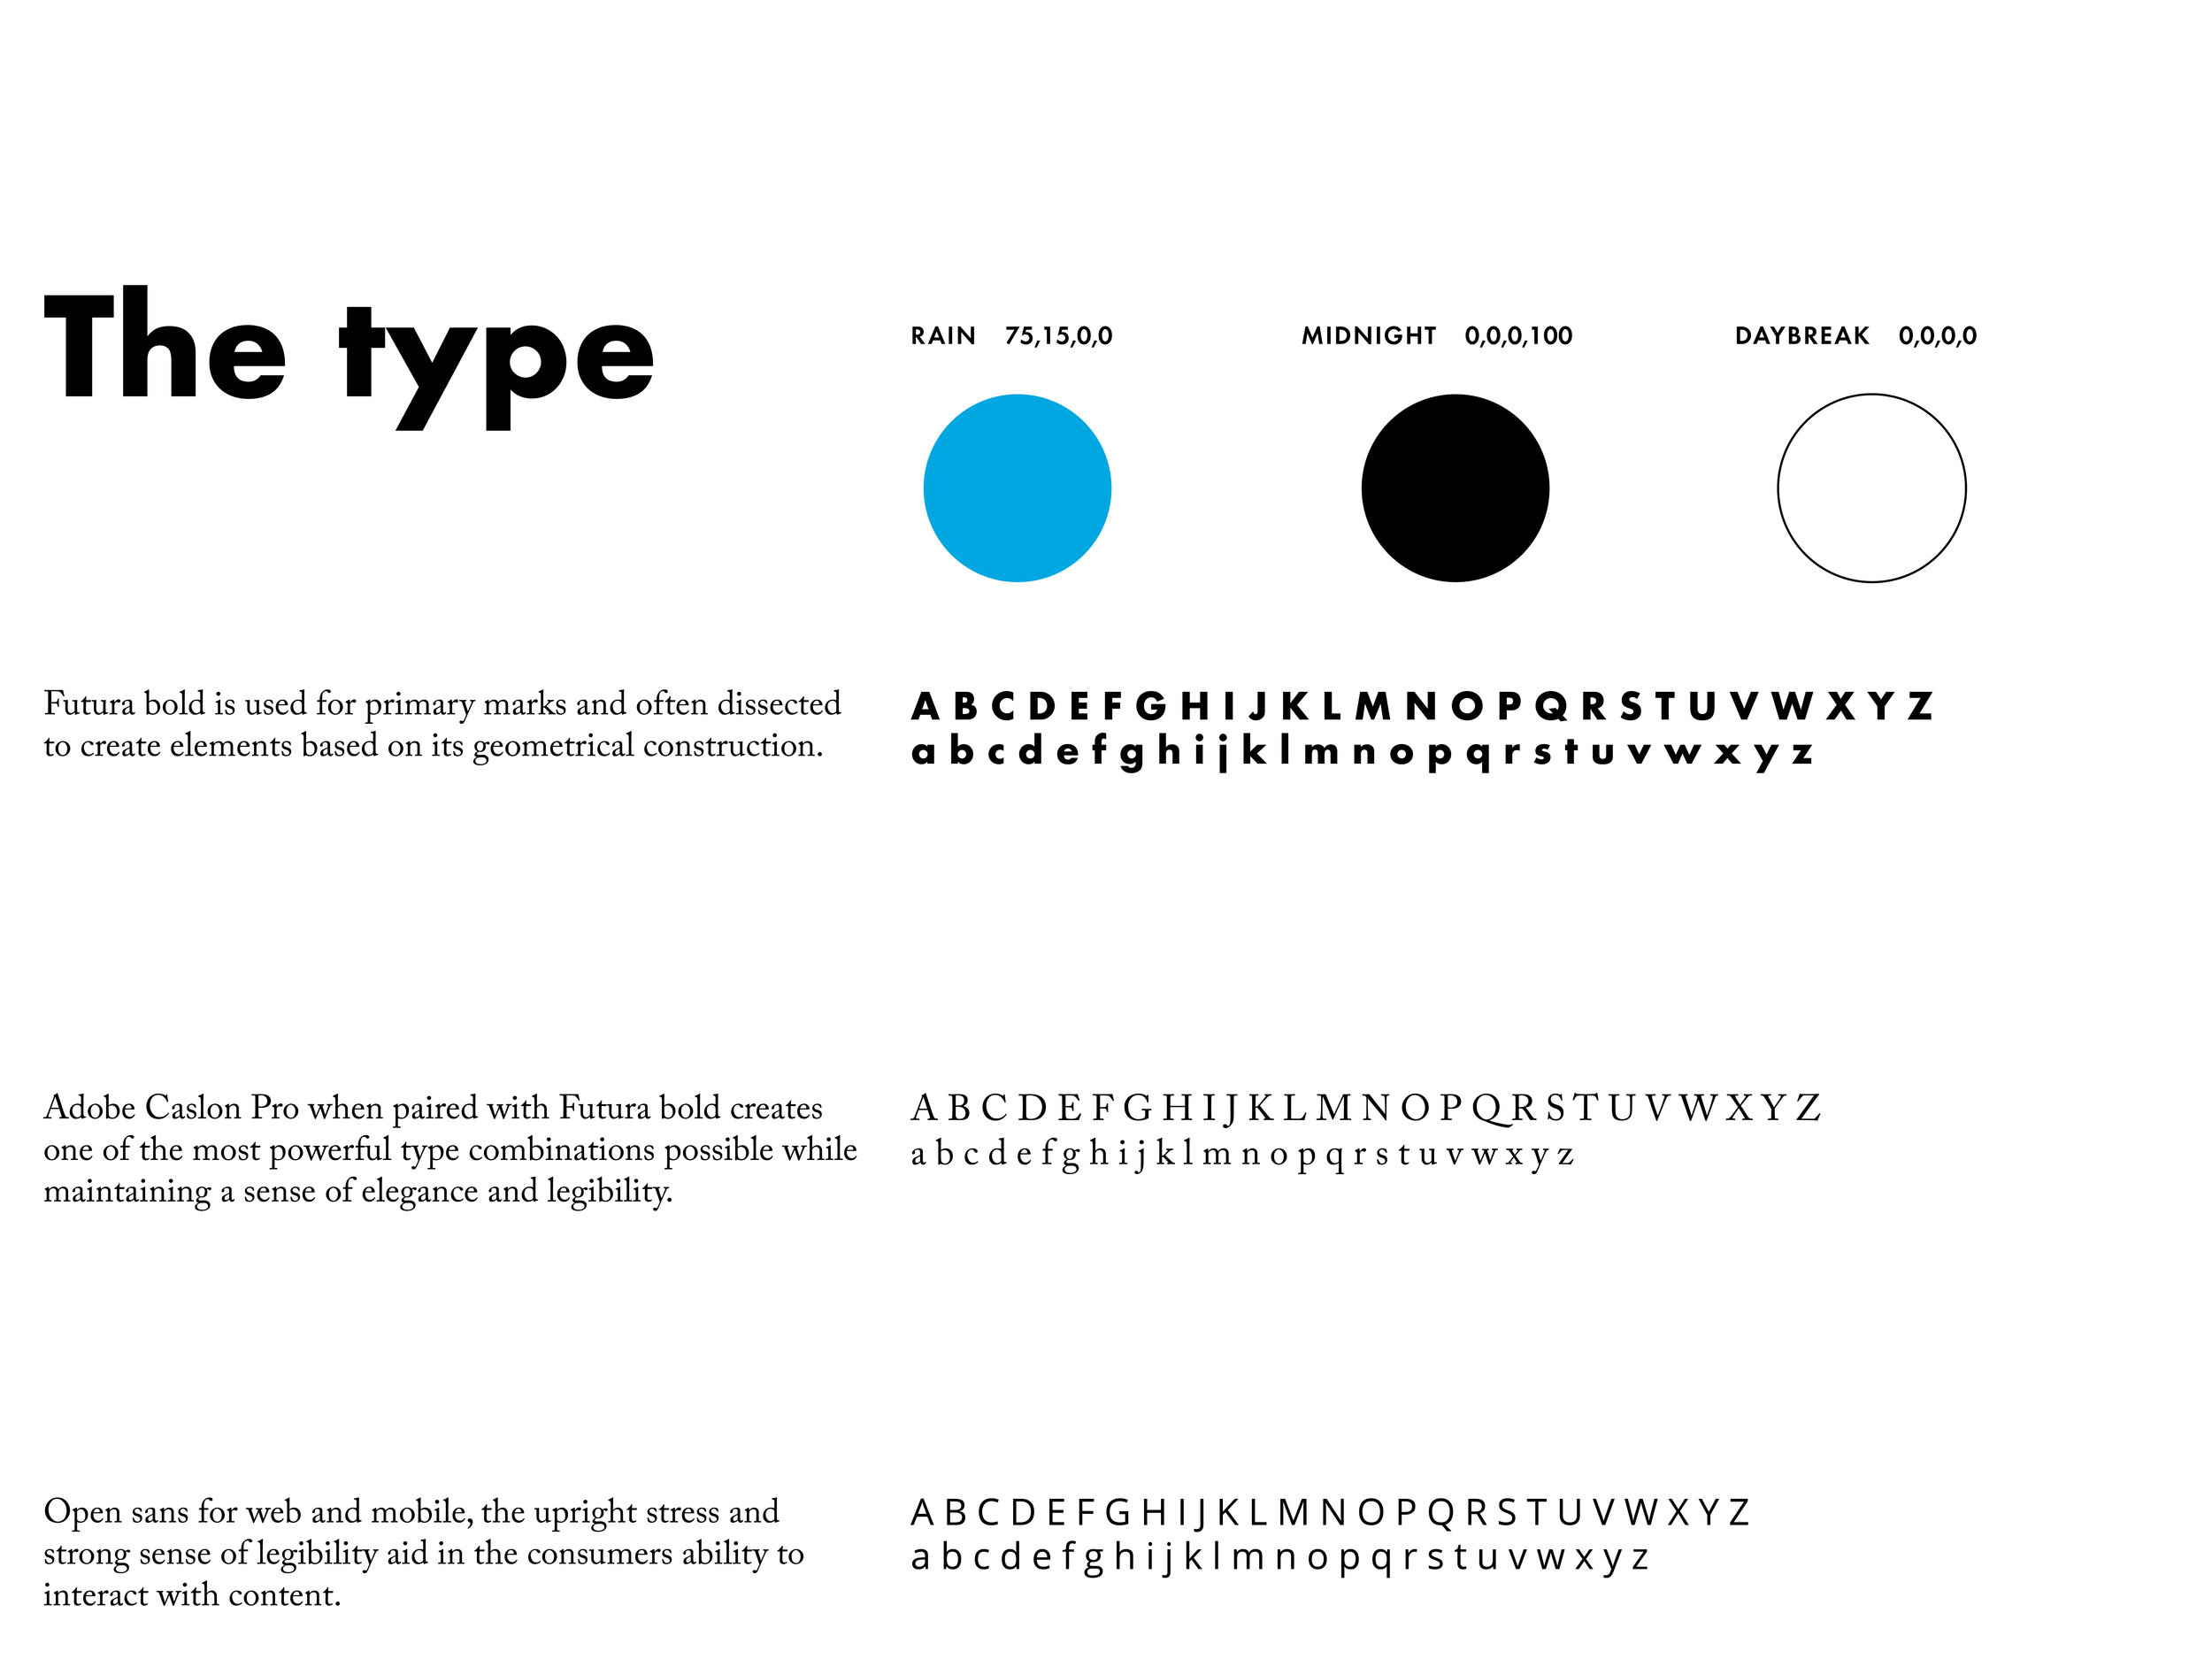 The type.jpg